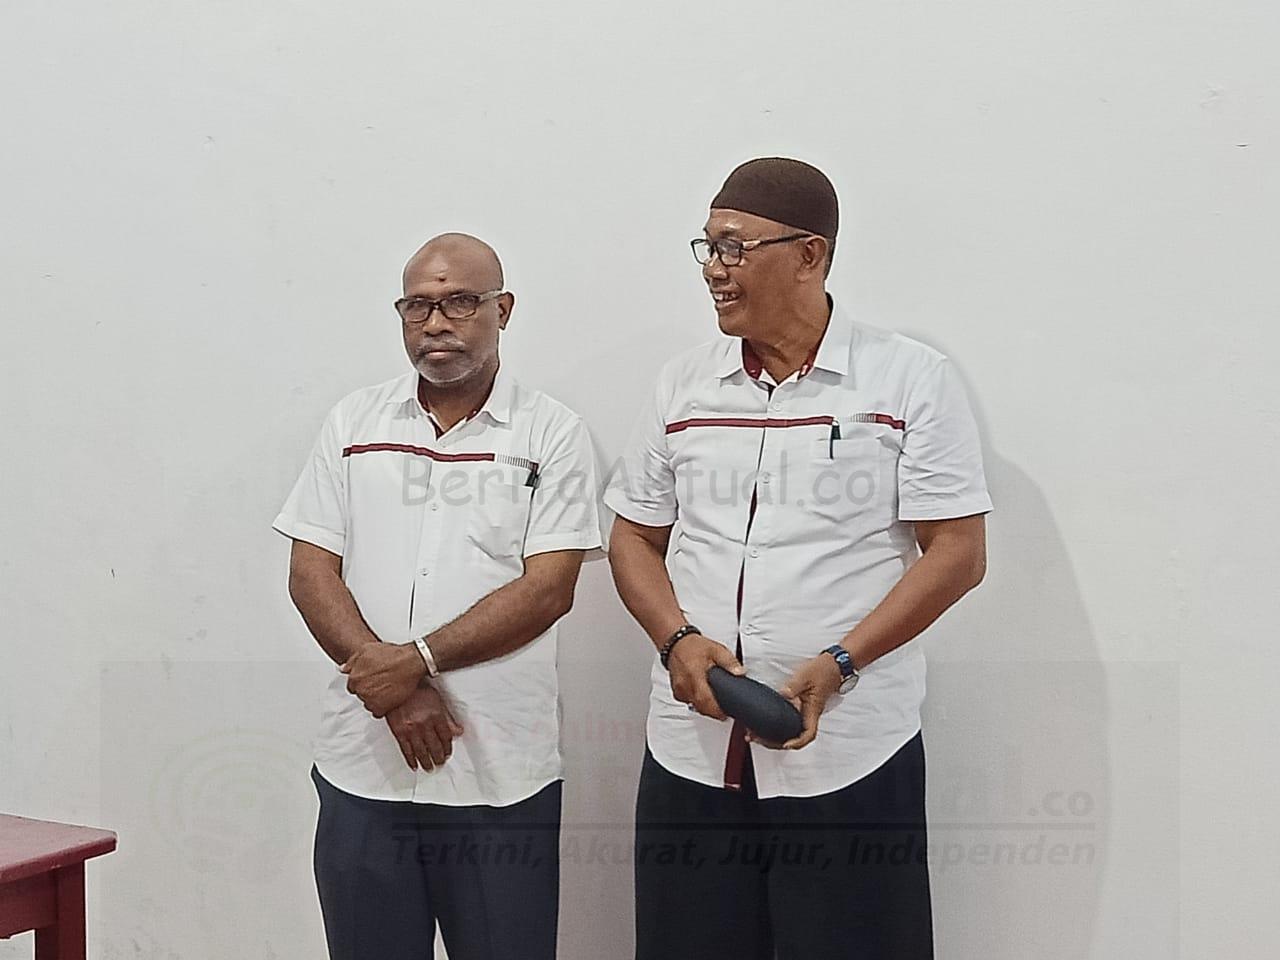 Saat Daftar di KPU, Kedatangan Boneftar - Waluyo Akan Disambut Tarian Nusantara 22 IMG 20200903 WA0032